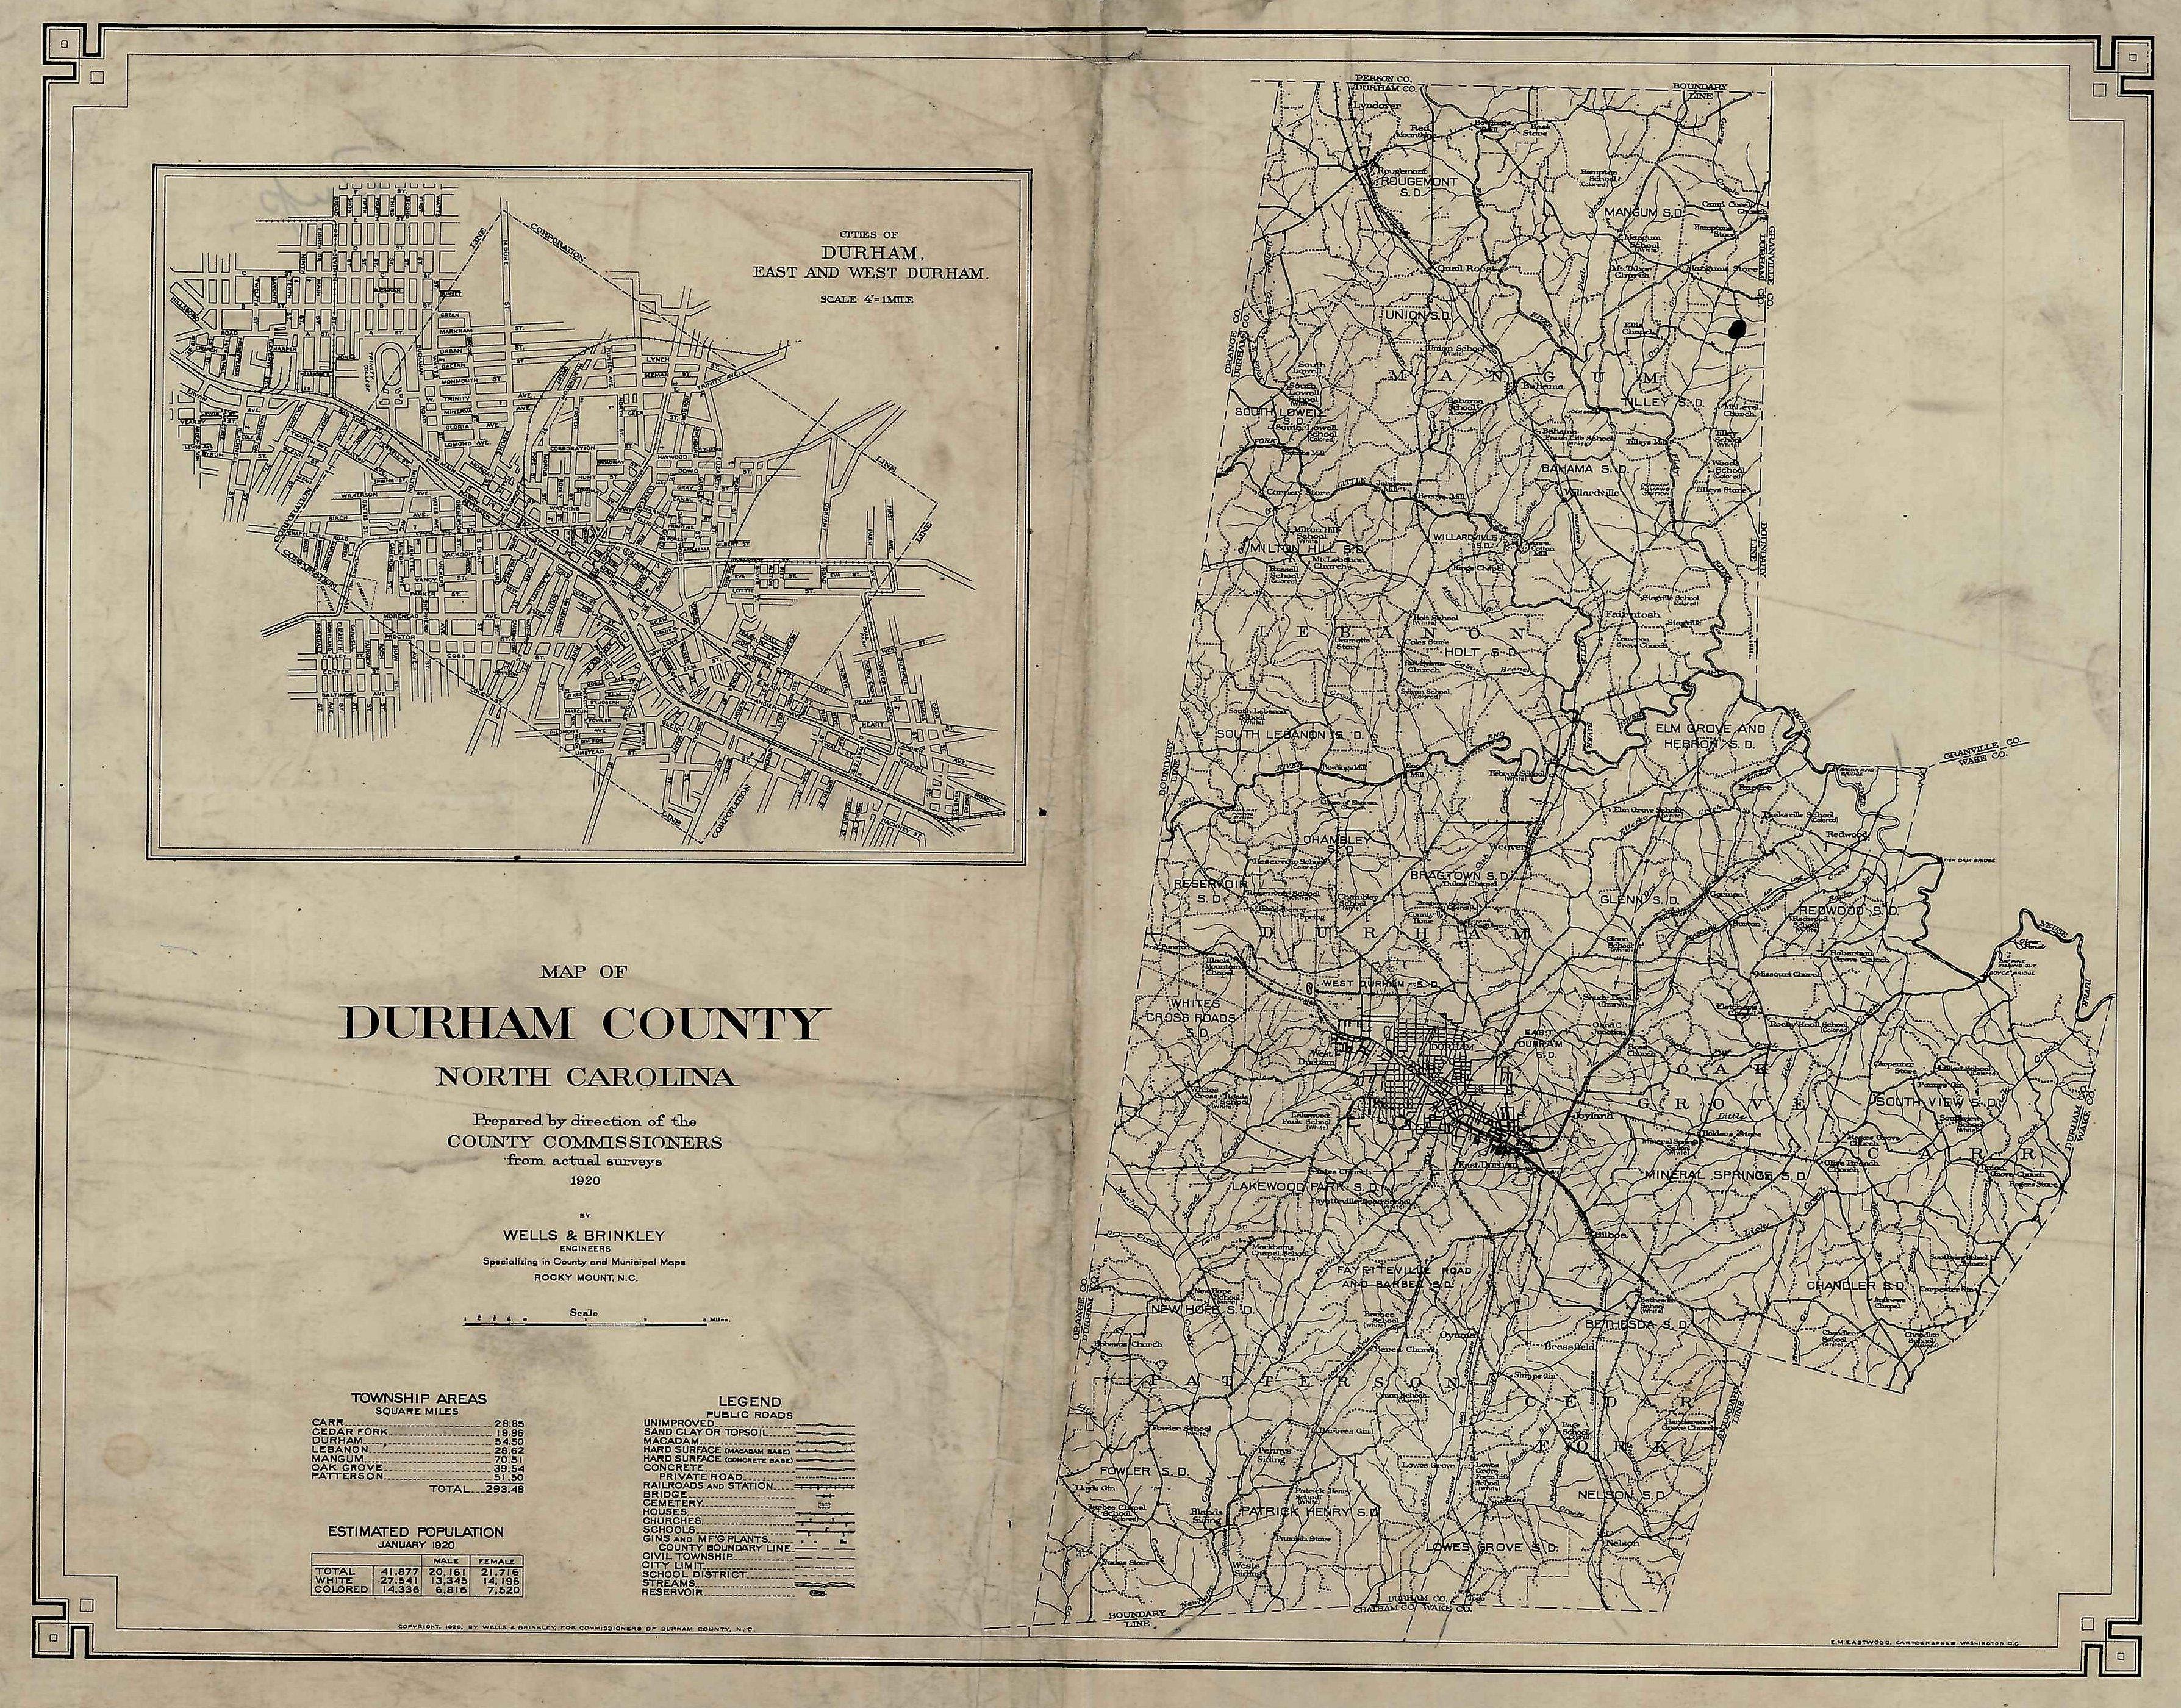 1910 Map of Durham County North Carolina